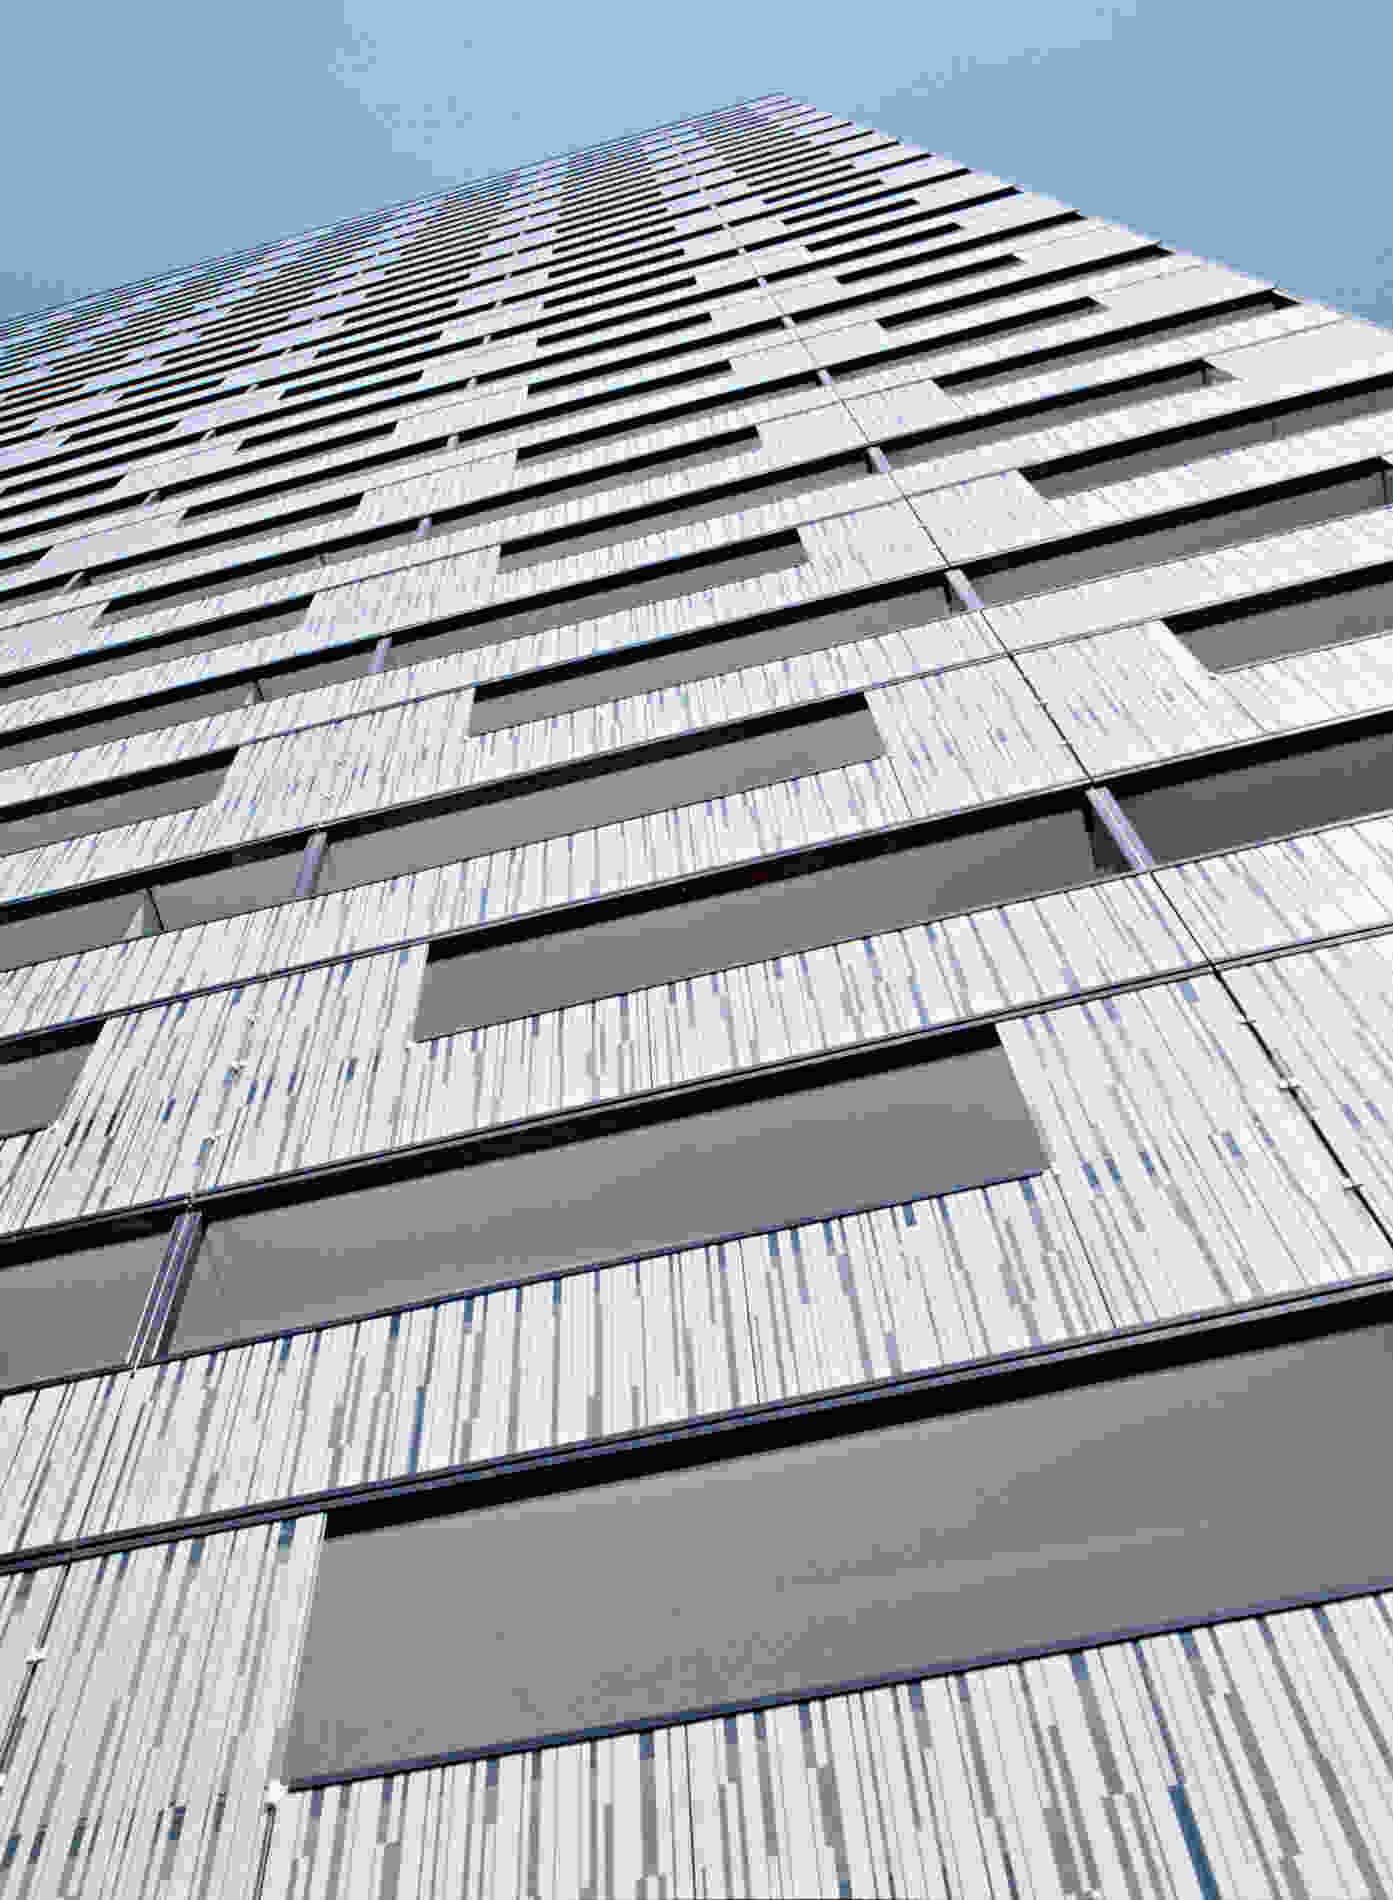 039 High Rise Wienerberg Herta Hurnaus 009 facade